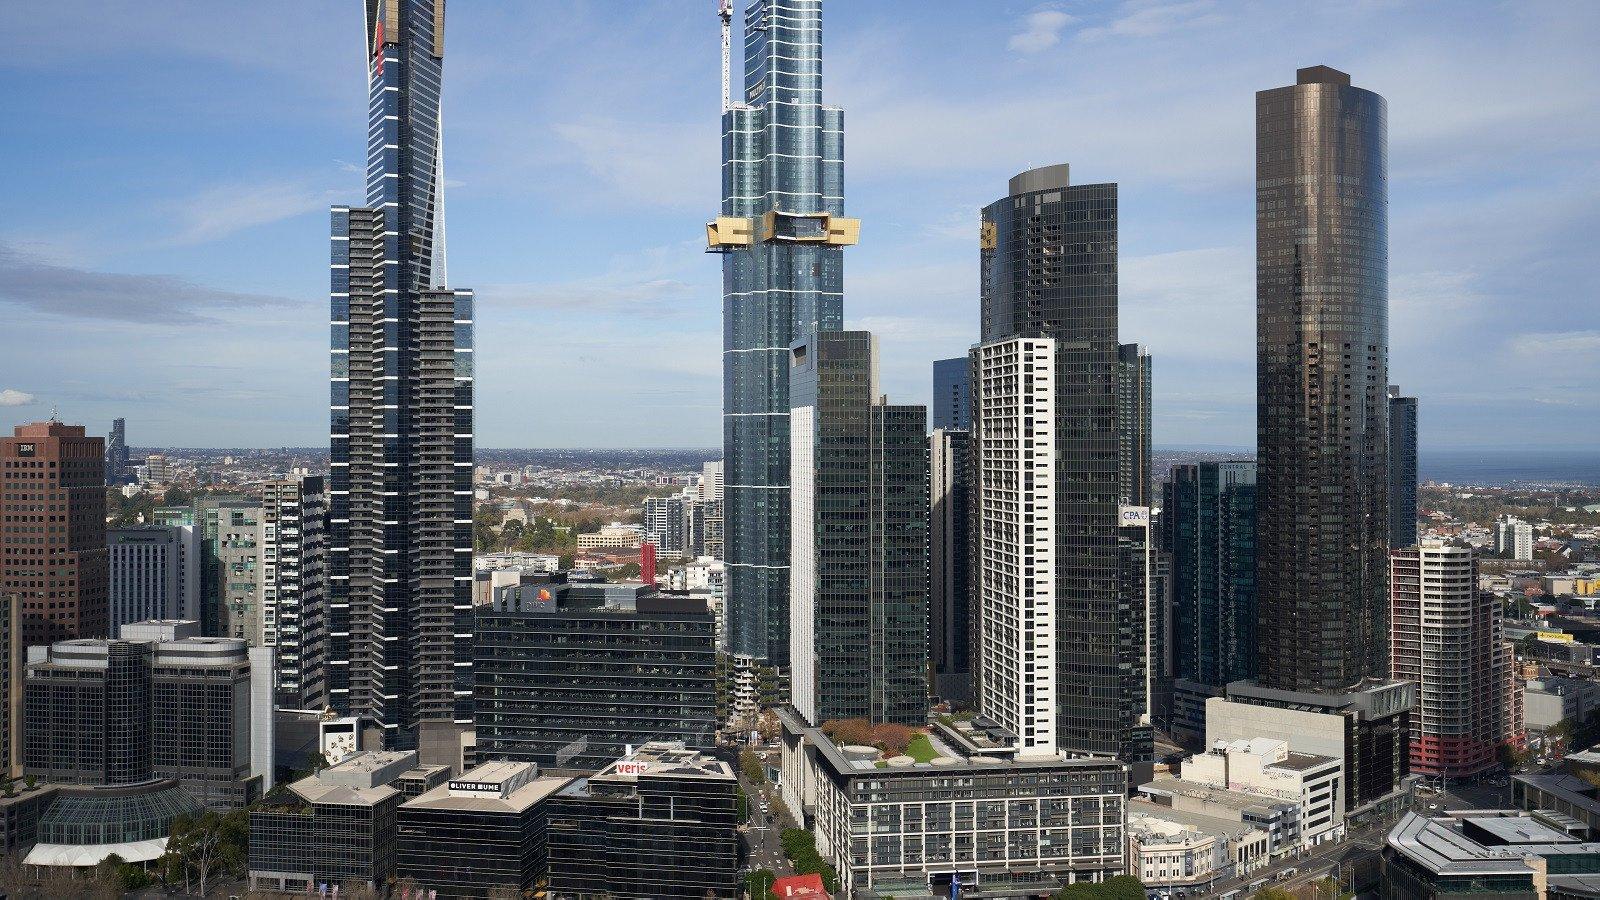 Australia 108 - Cloud Rise-image-5